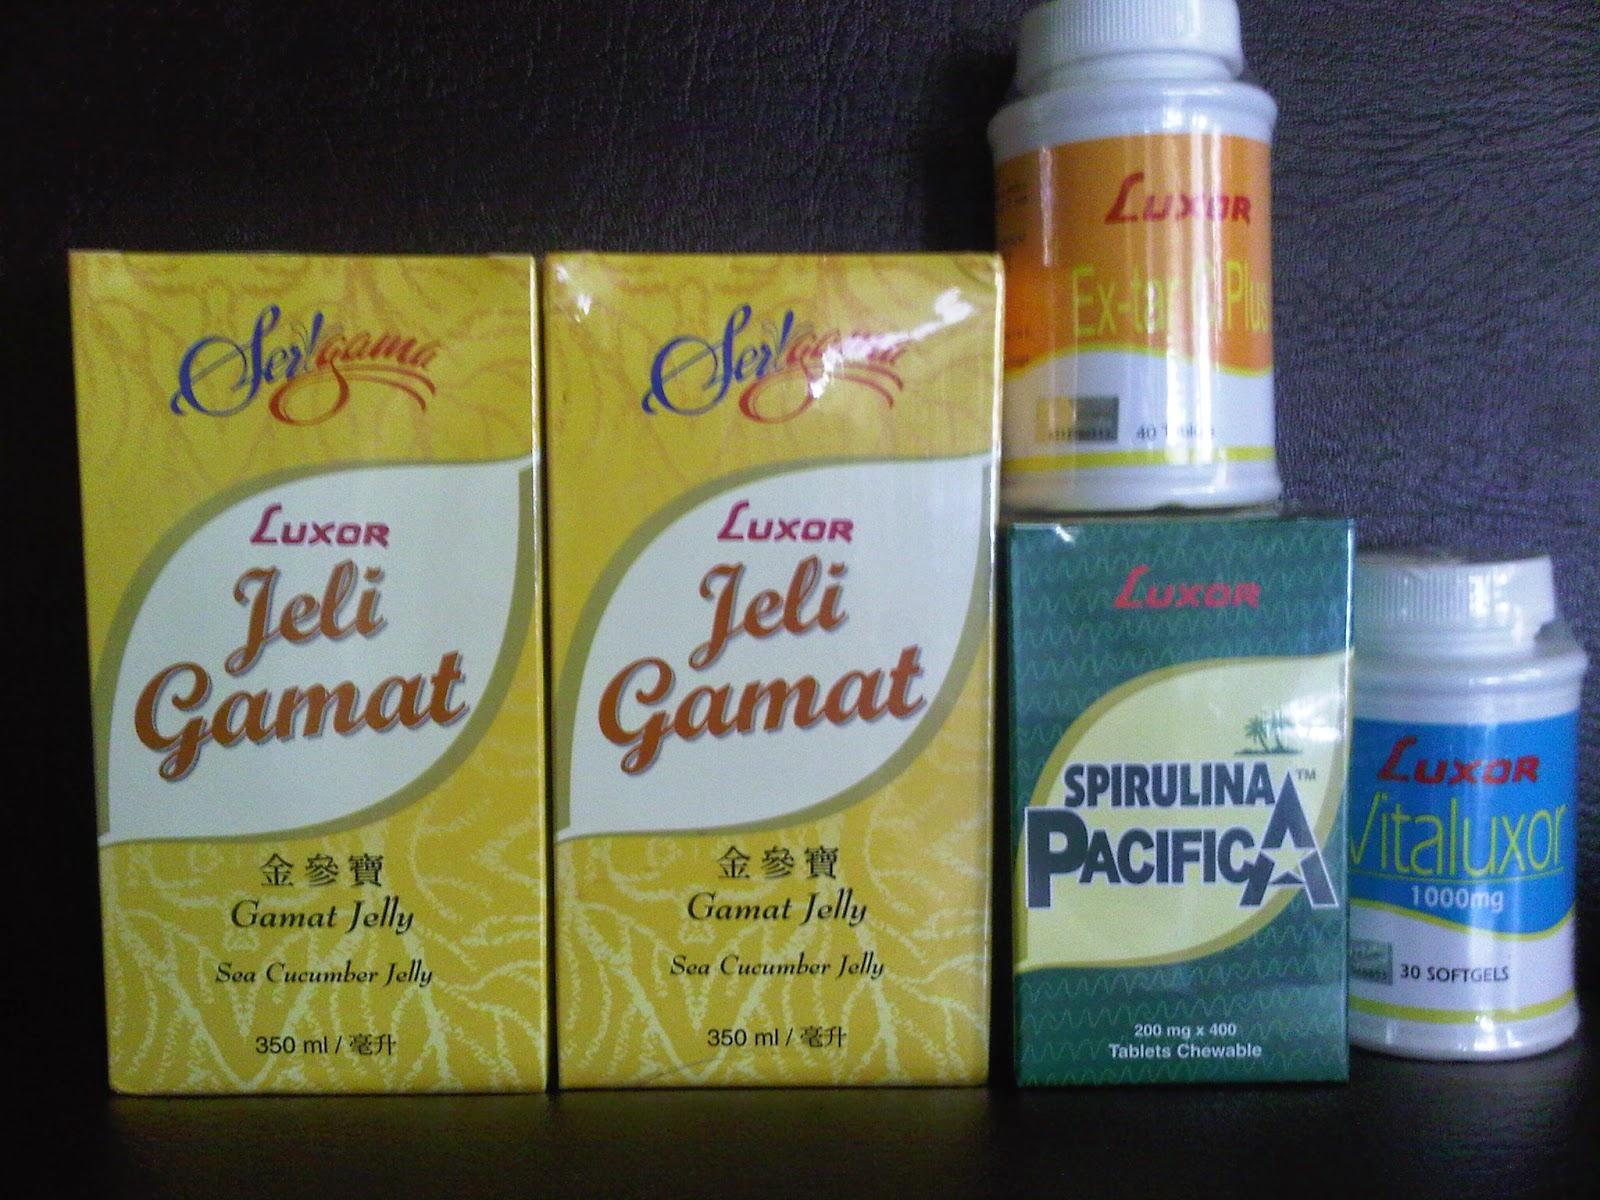 obat ampuh penyakit berat